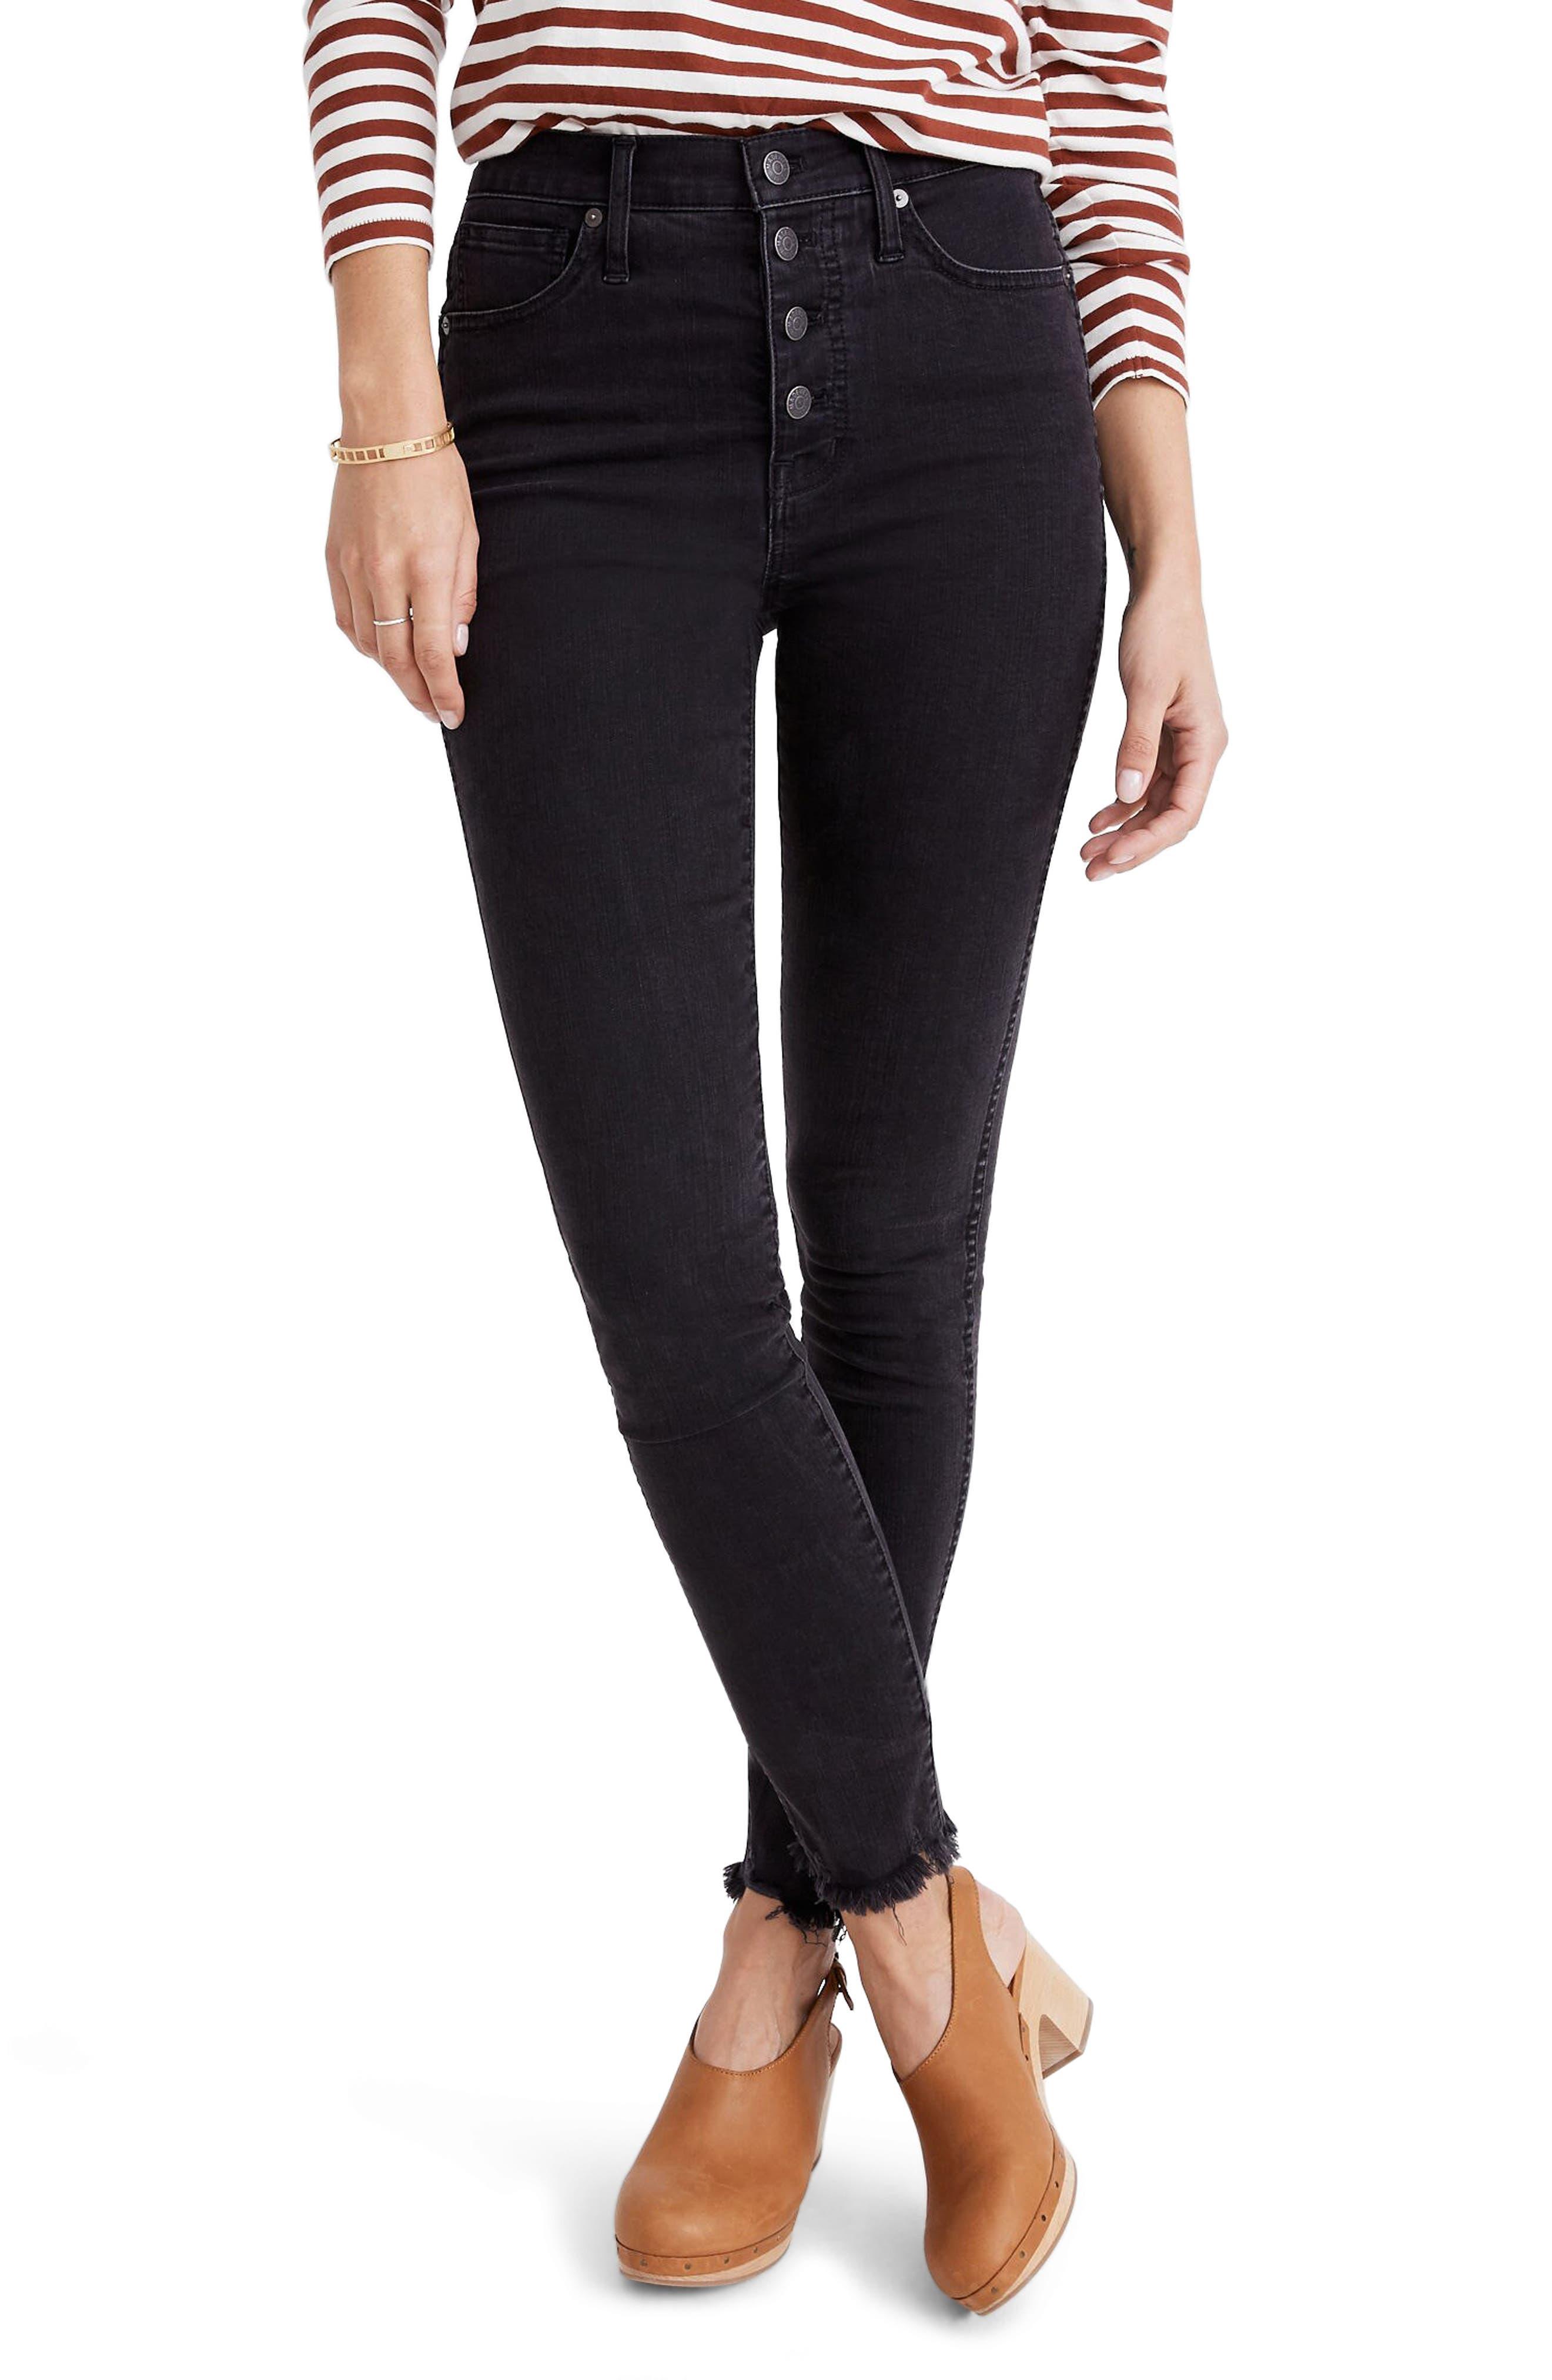 Madewell 10-Inch High Waist Skinny Jeans Button-Through Edition (Berkeley Wash) (Regular & Plus Size)